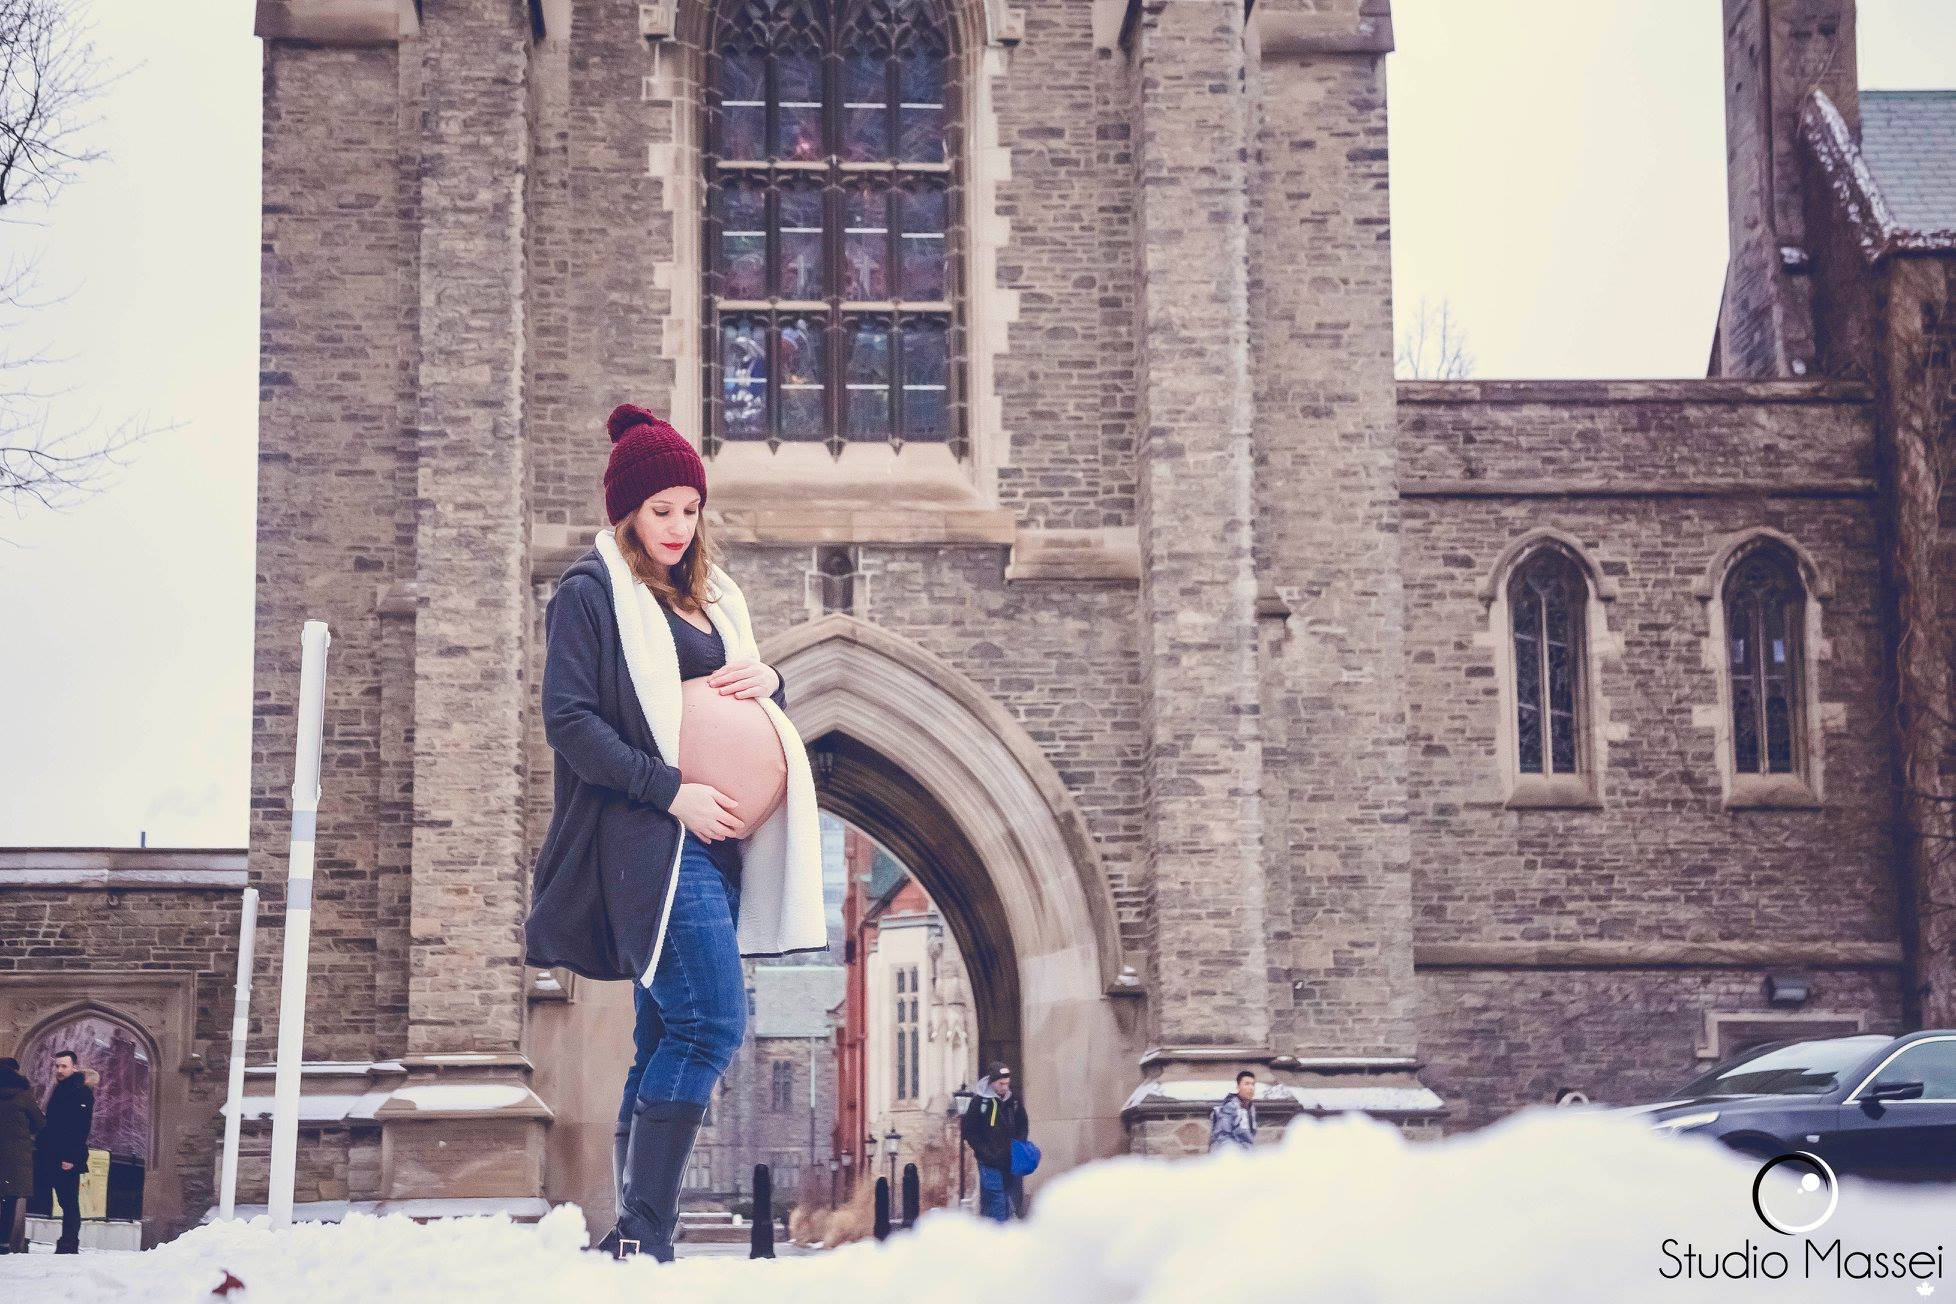 University of Toronto - Toronto